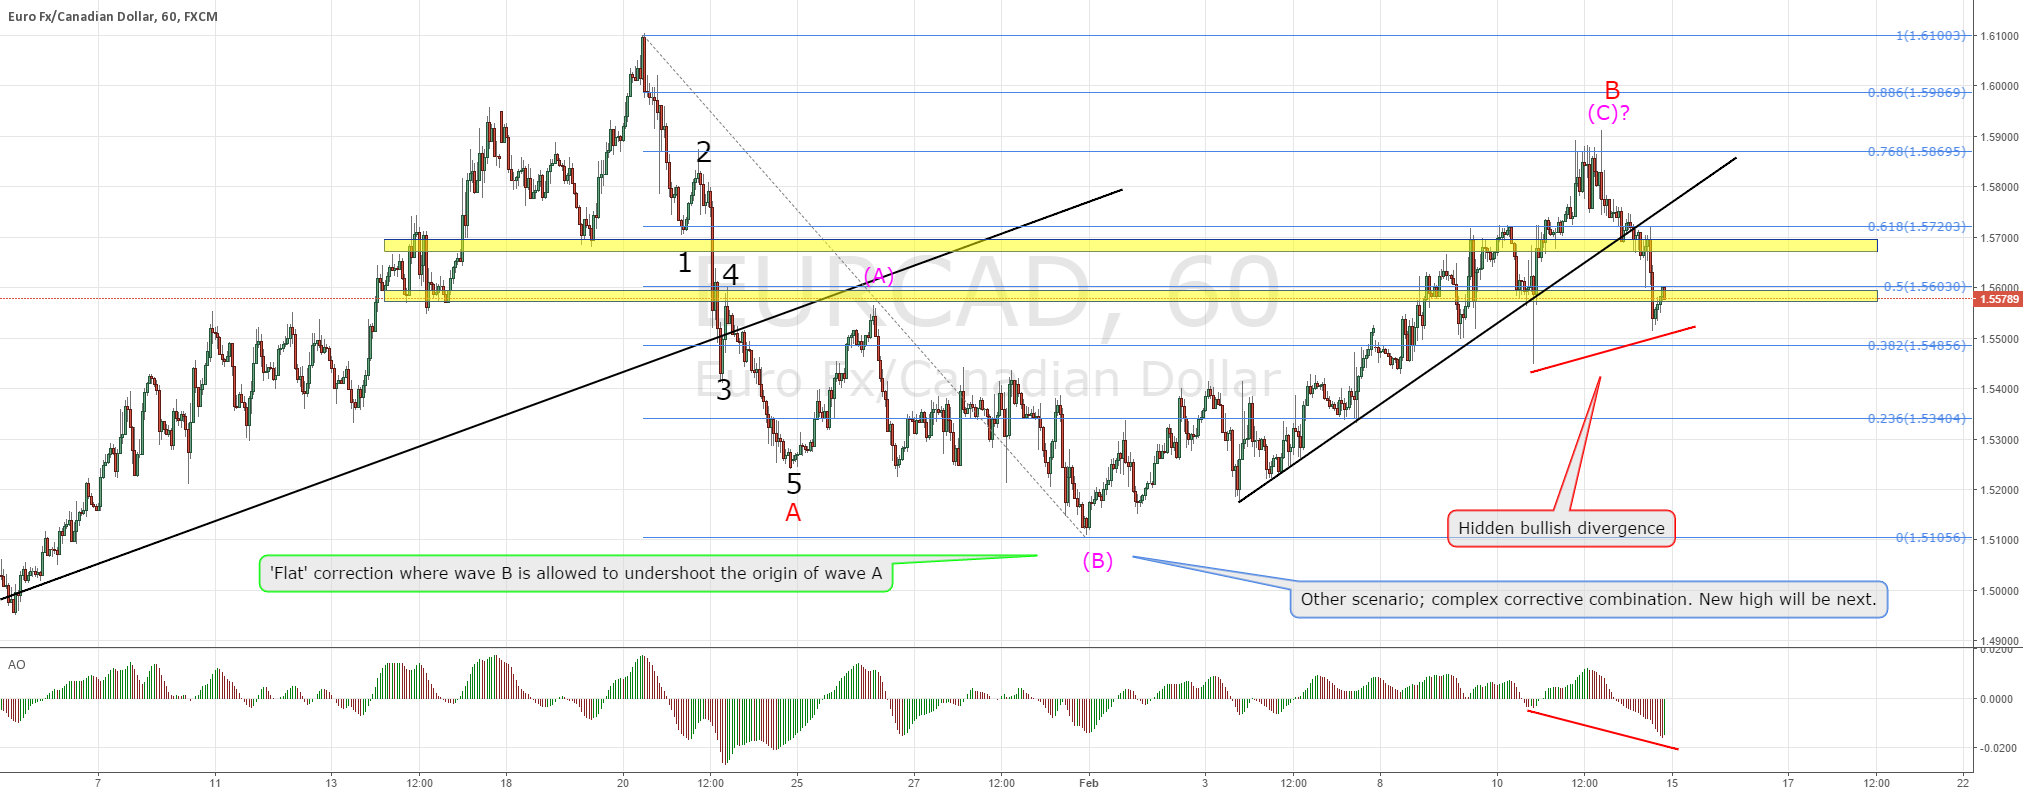 EURCAD short term/long term trade opportunity